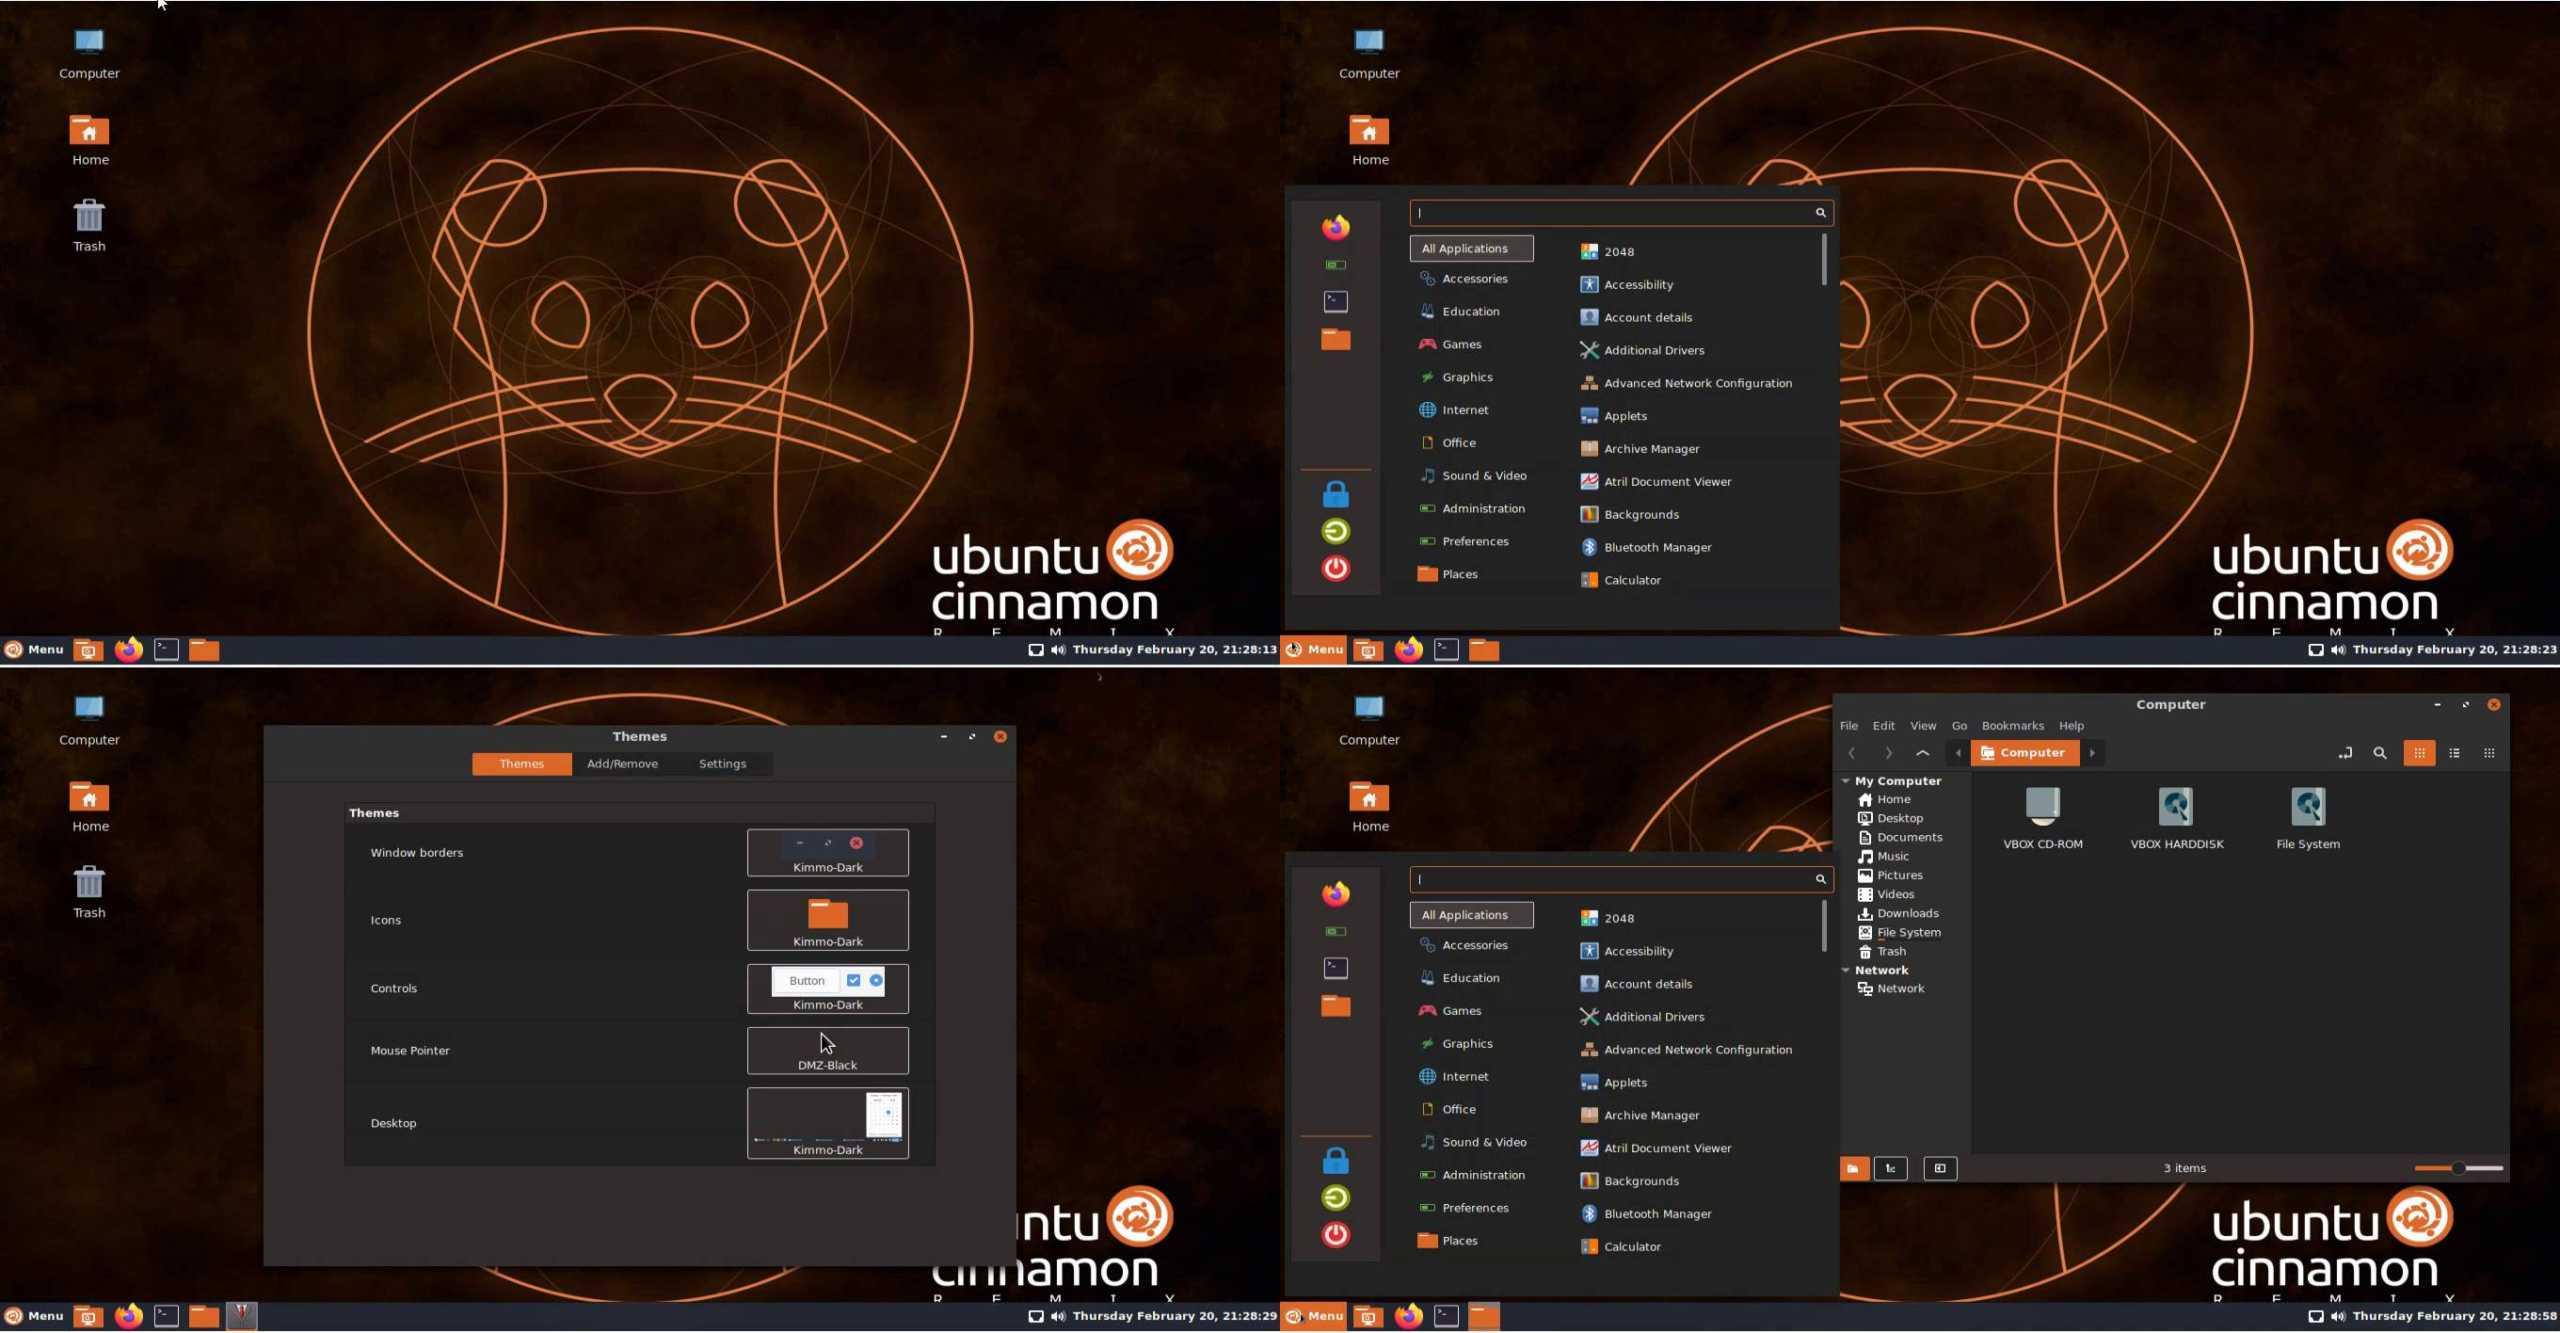 Ubuntu Cinnamon Remix interface screenshot